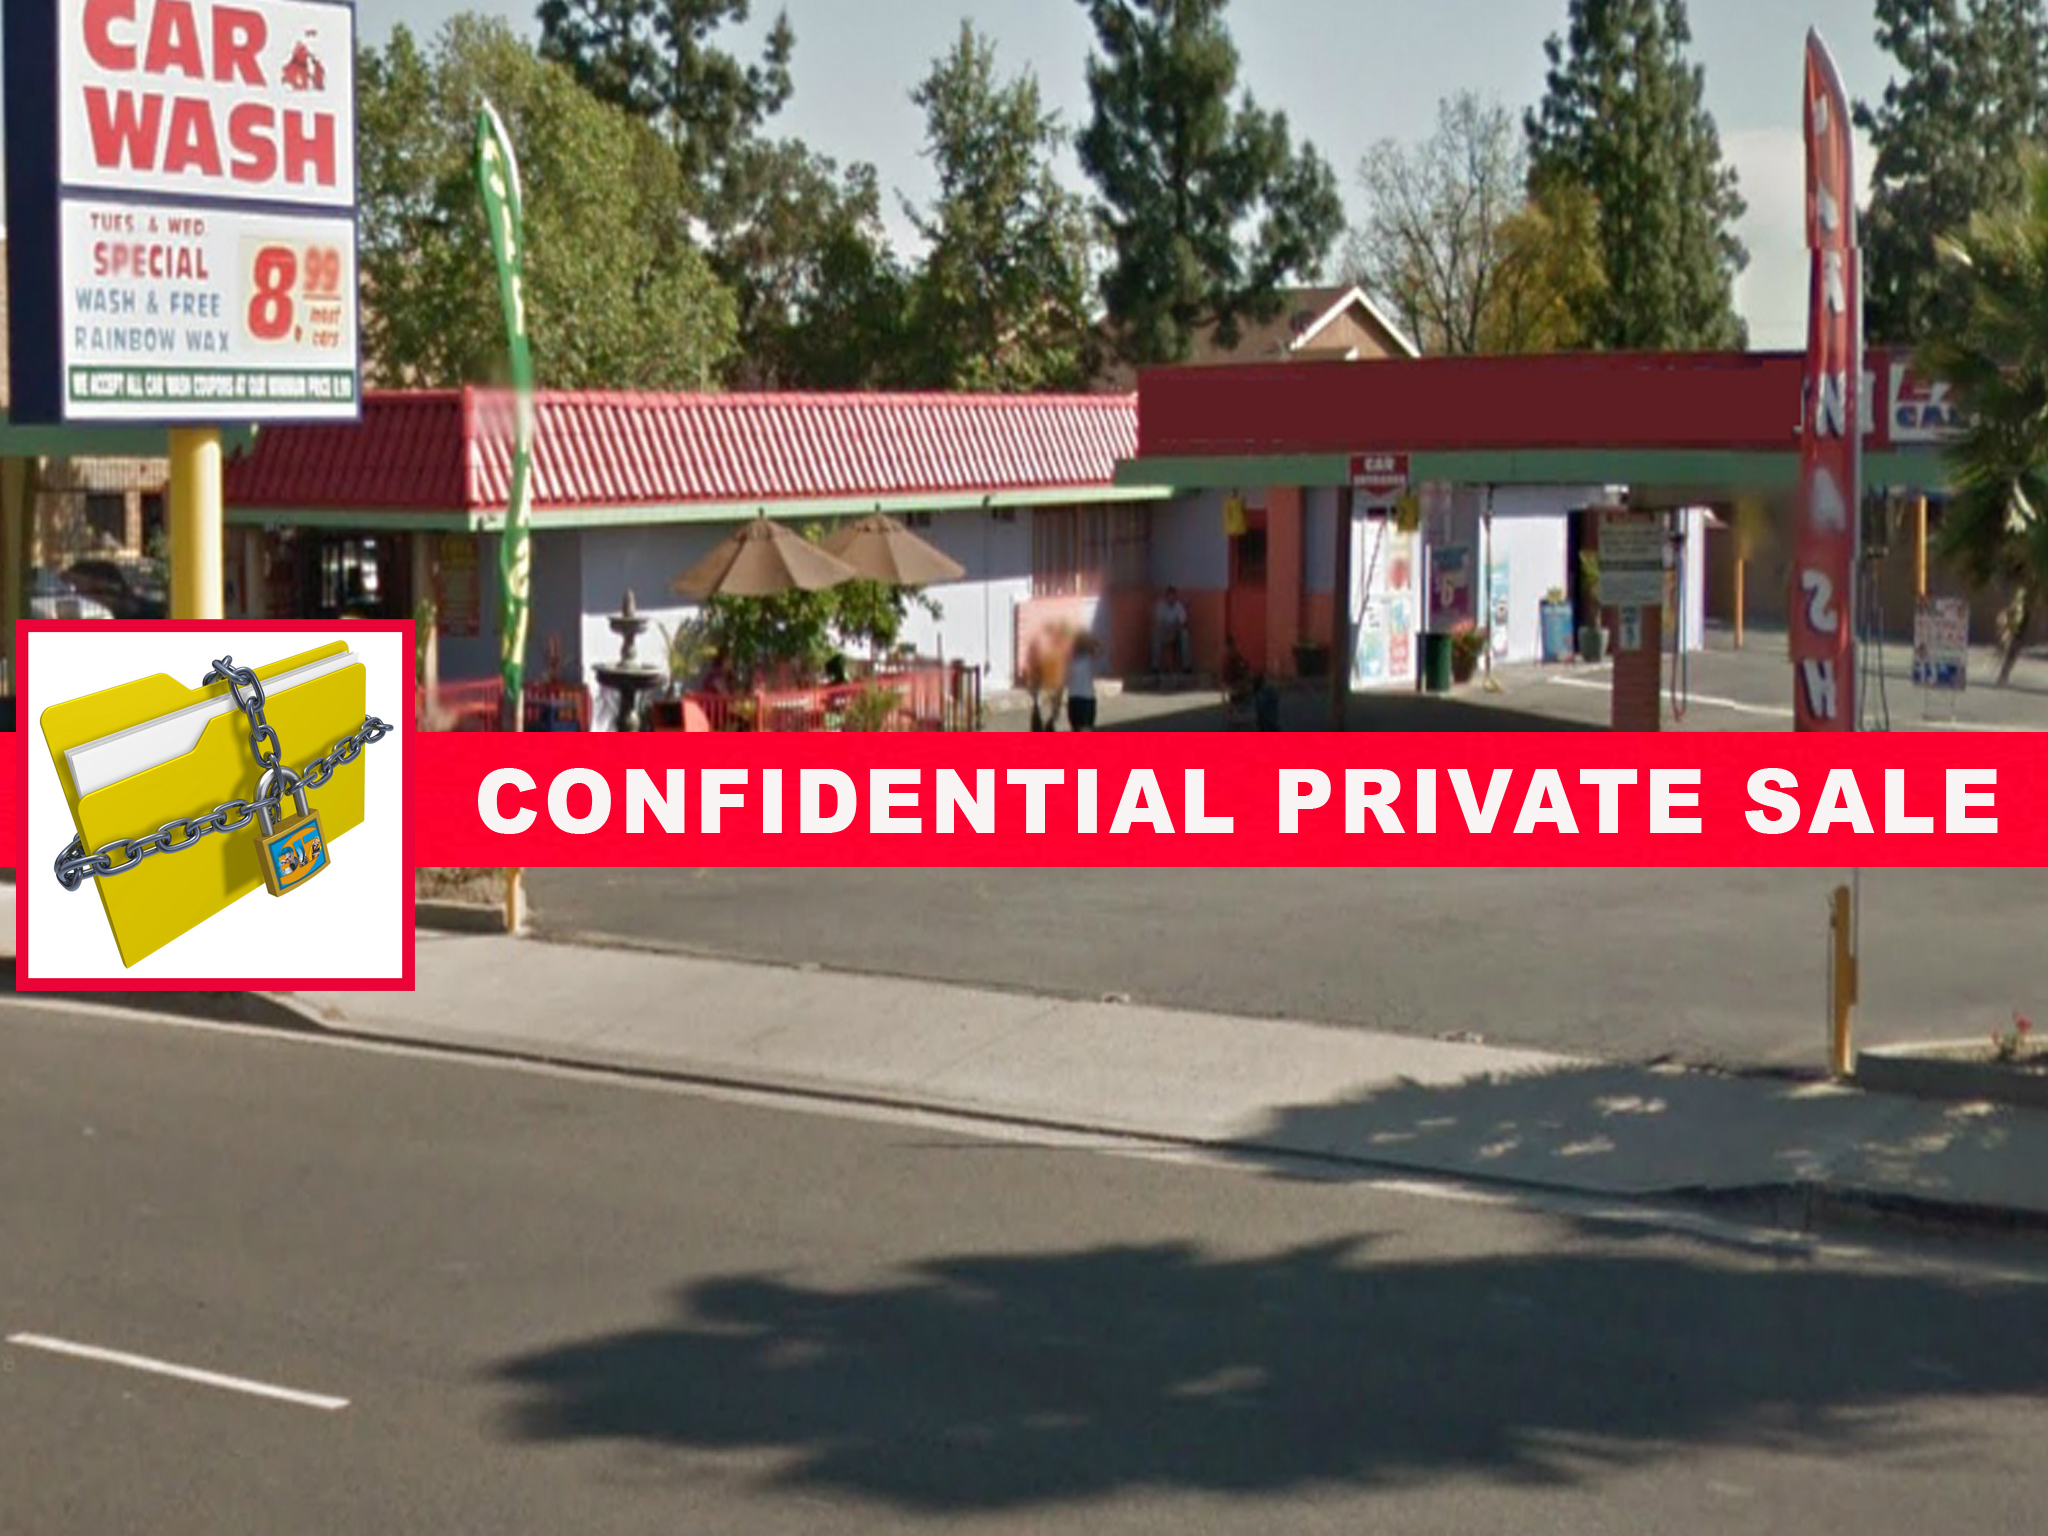 Cps Car Loan >> Profitable Hand Car Wash With Real Estate! | BIZ Builder.Com